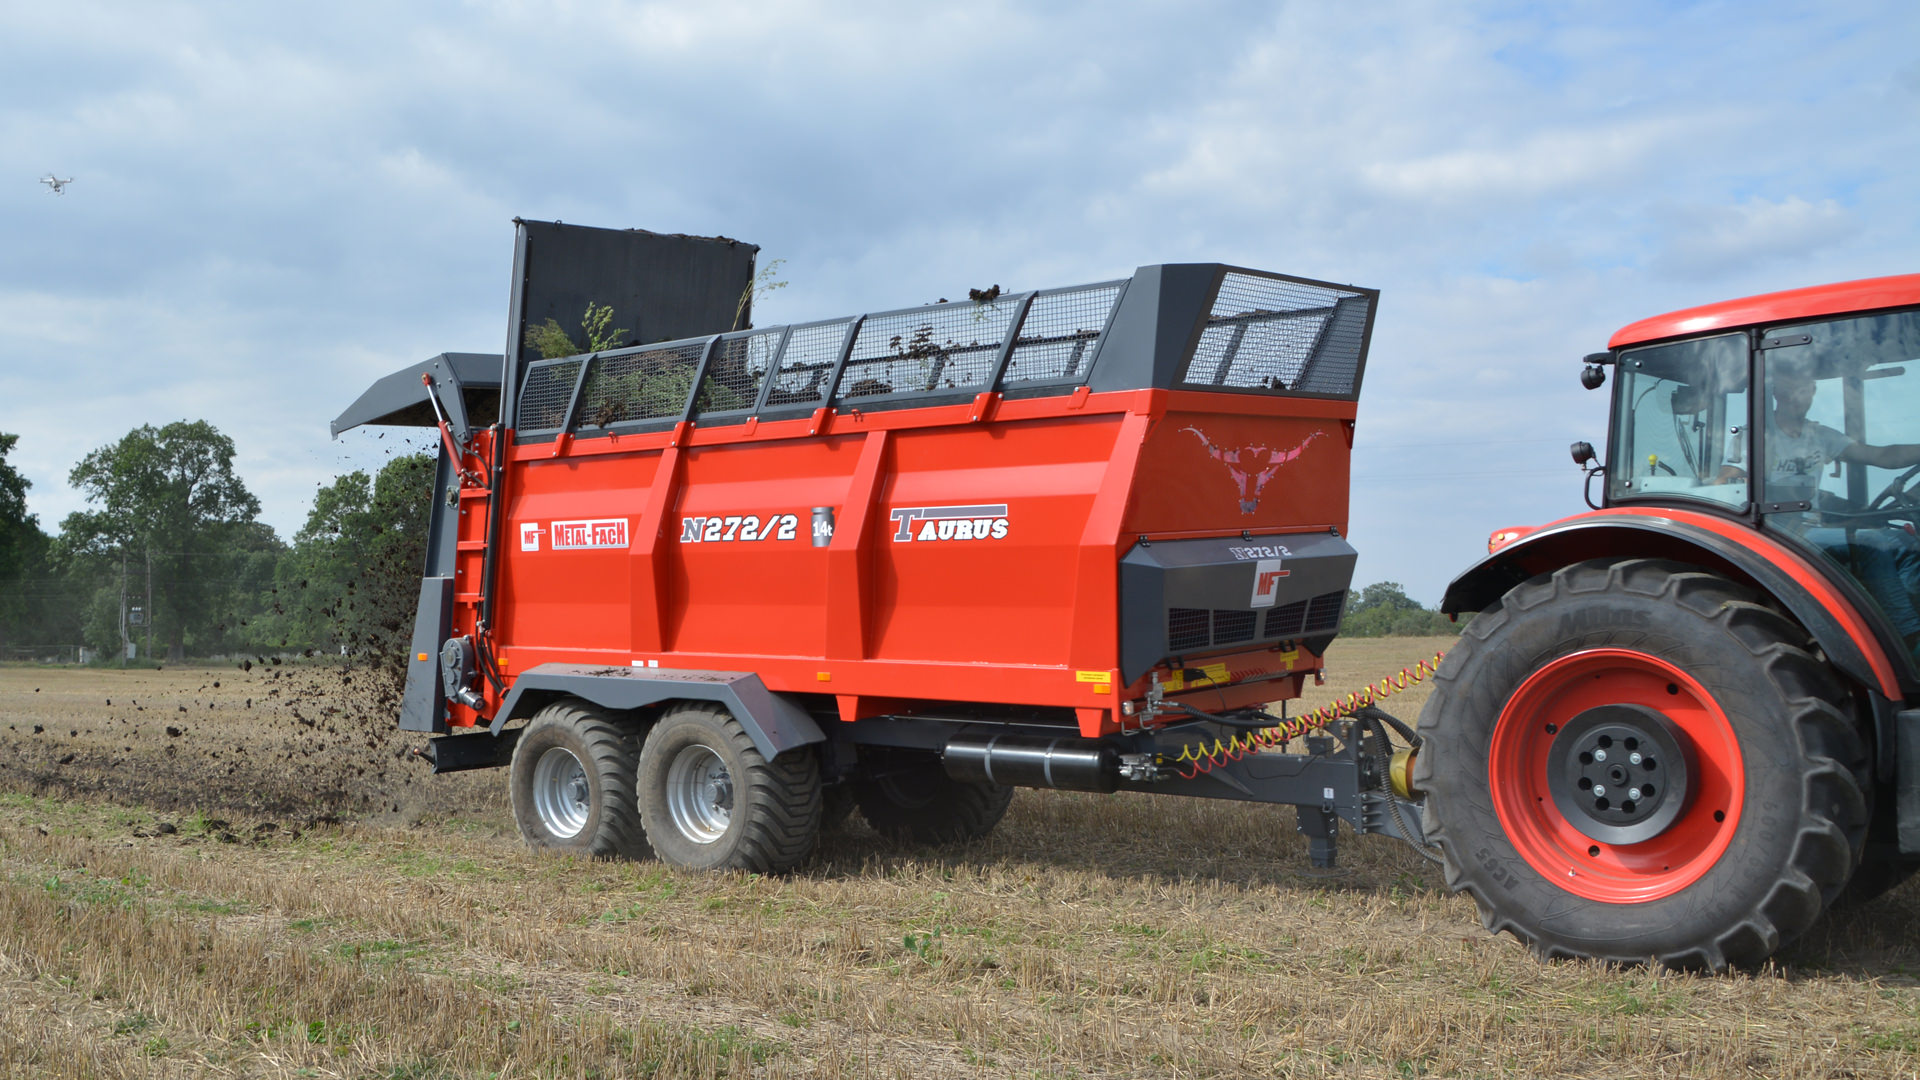 Разбрасыватель удобрений 12 тонн N-272/5, адаптер 2 шнека «TAURUS», METAL-FACH